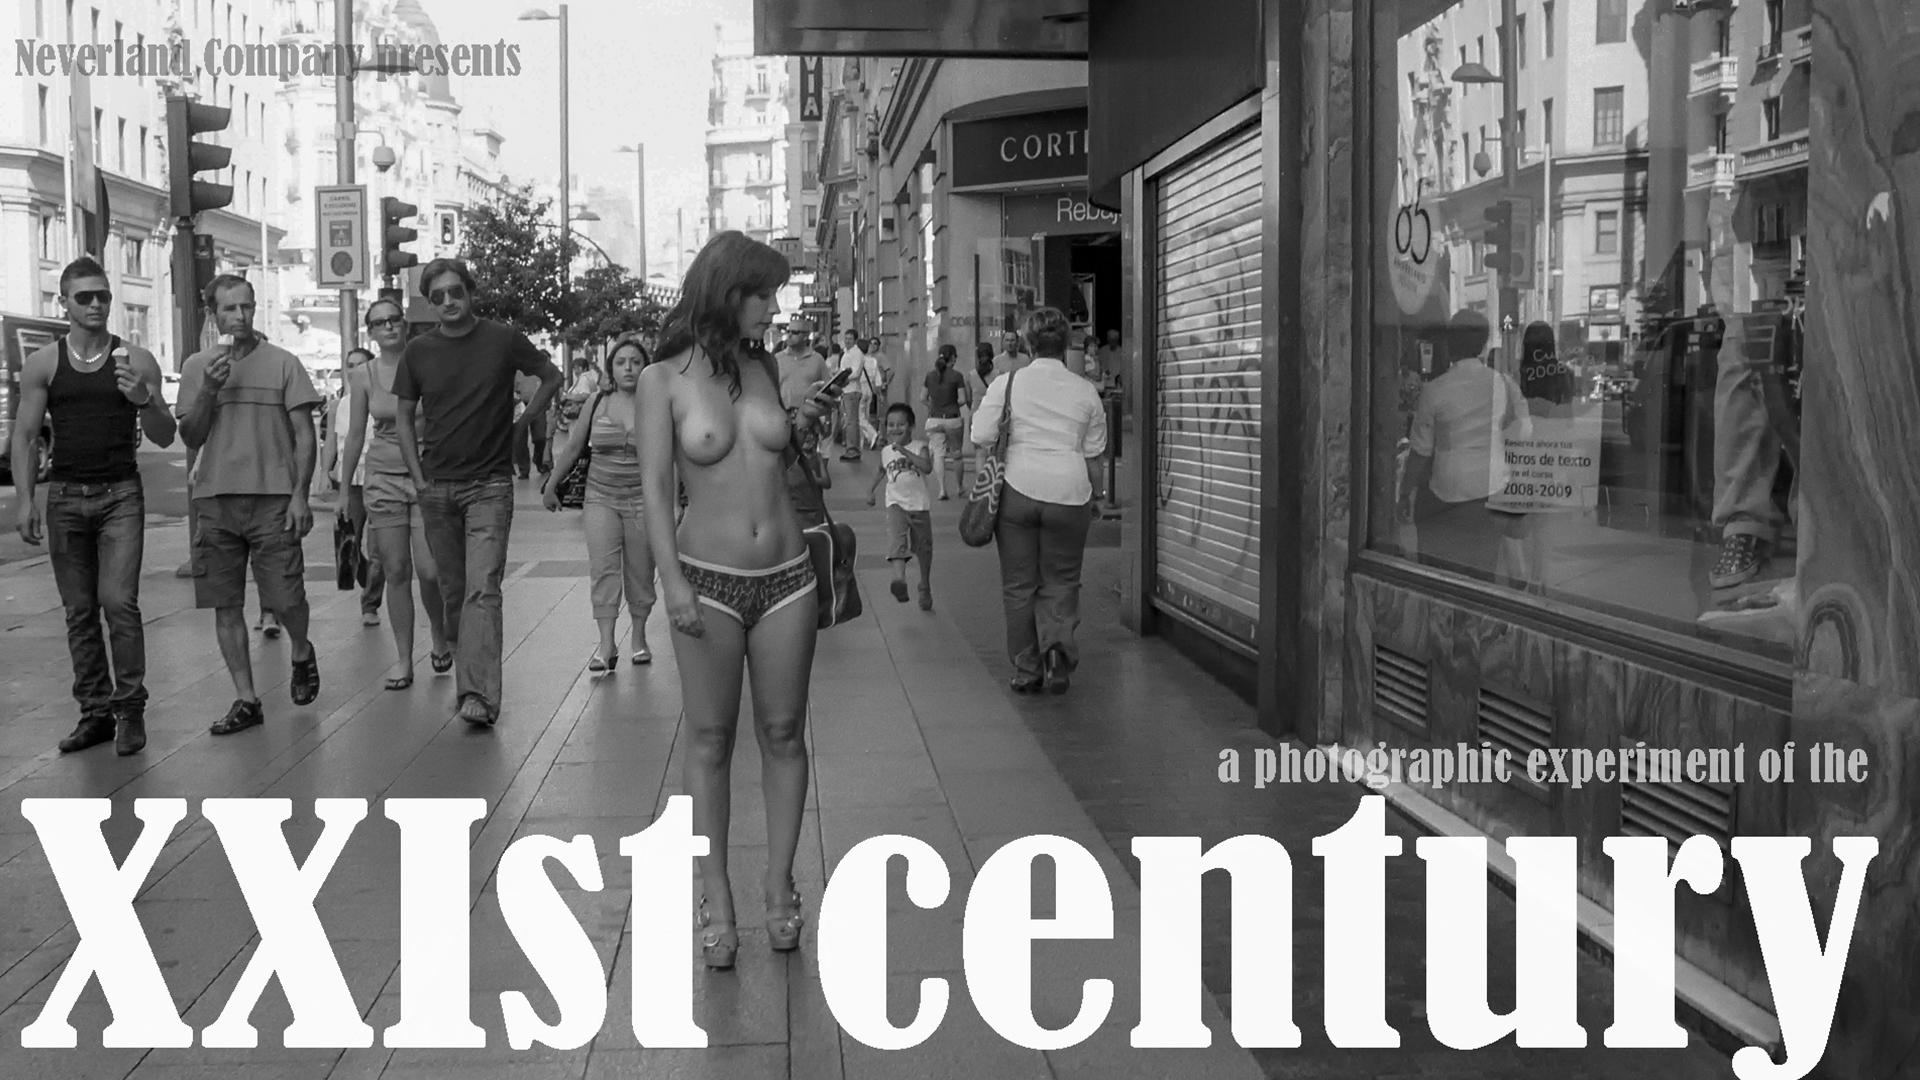 XXIst century